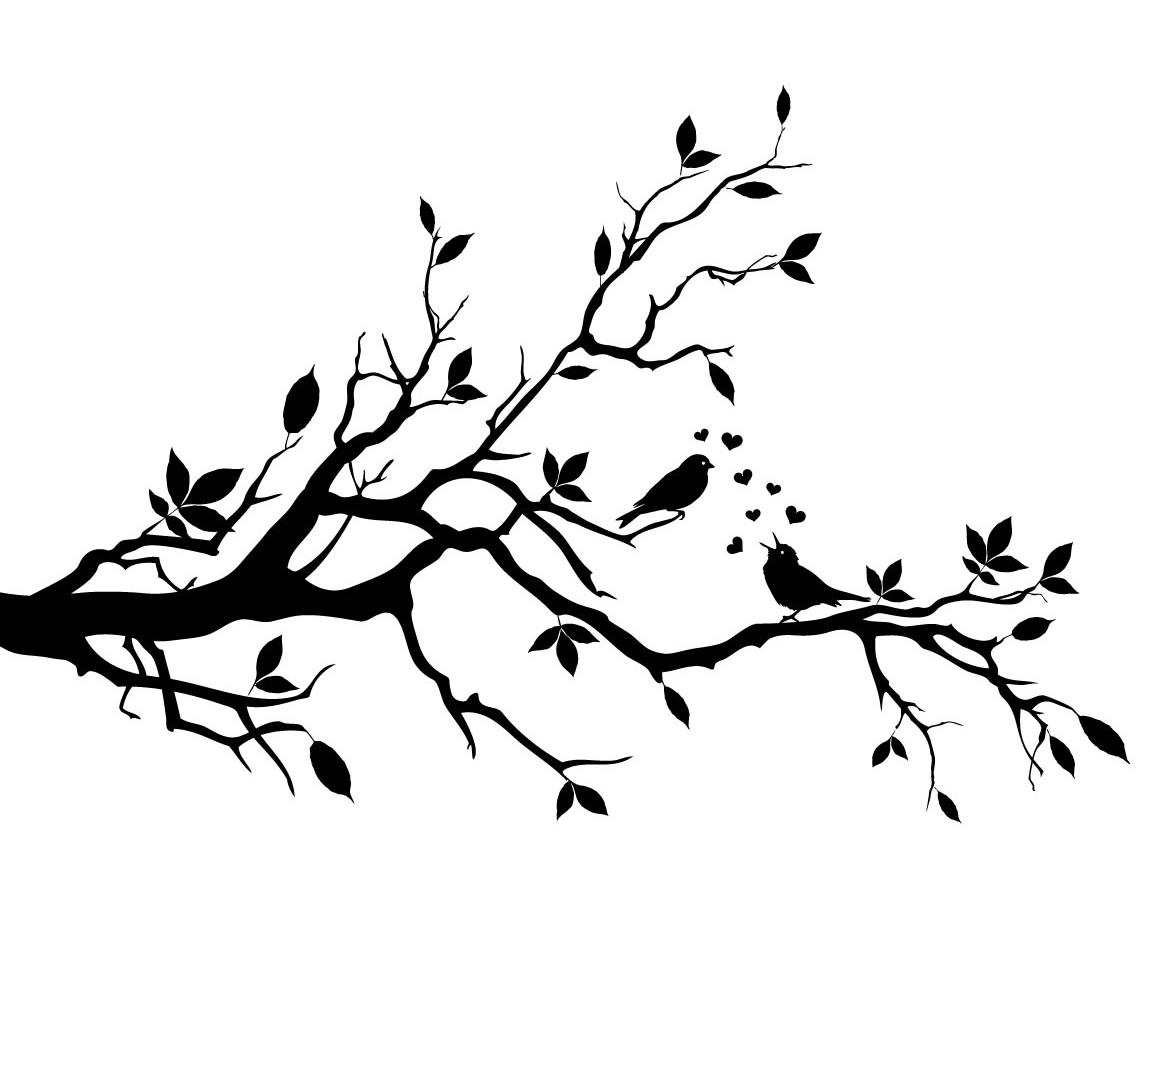 Flying Love Birds Drawing